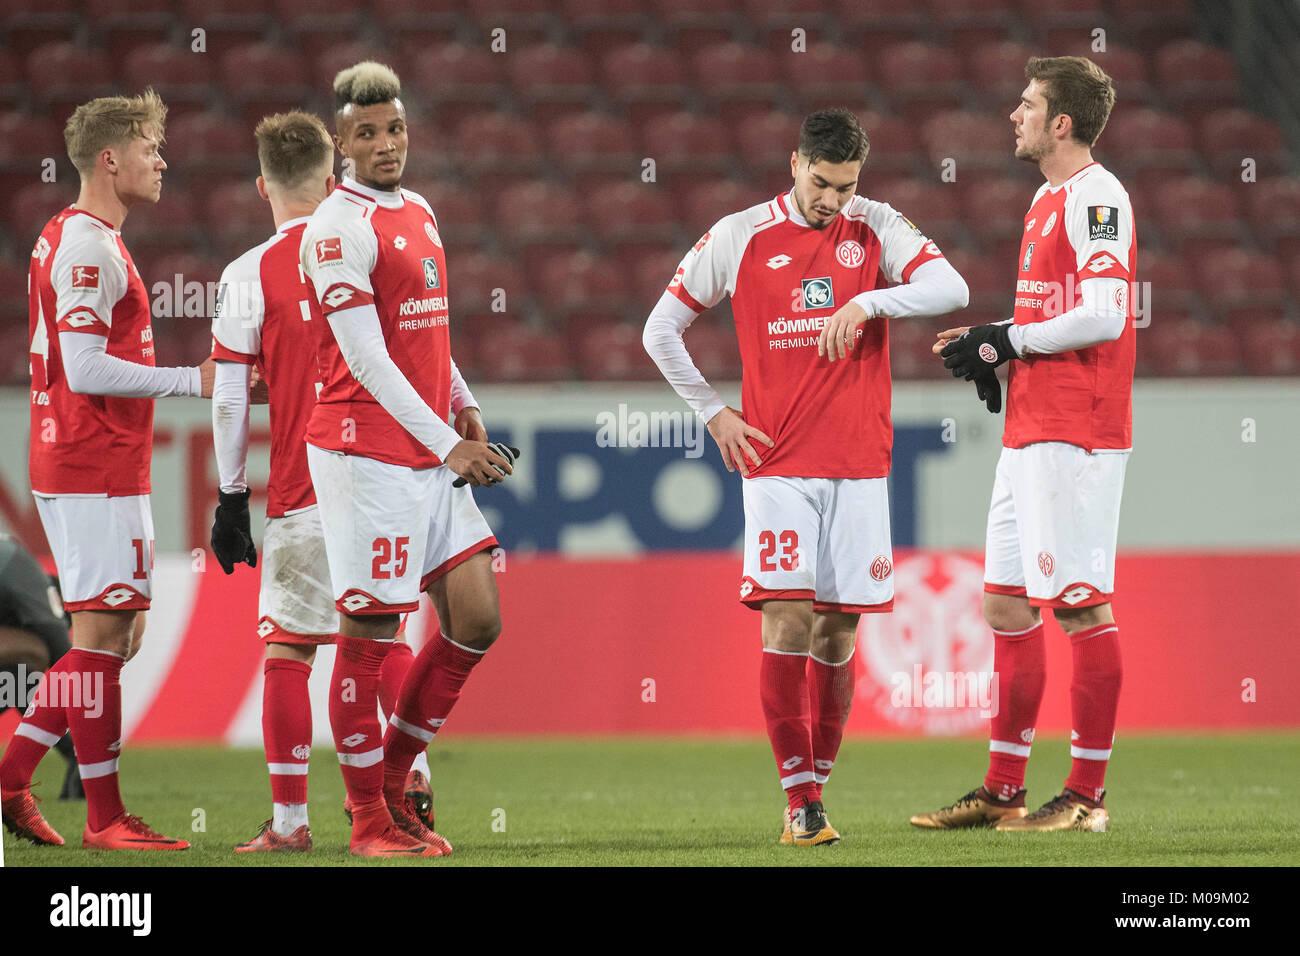 dejected after Spielschluss: die Mainzer Spieler  (v.r.)Stefan BELL (MZ), Suat SERDAR (MZ) und Jean-Philippe GBAMIN - Stock Image